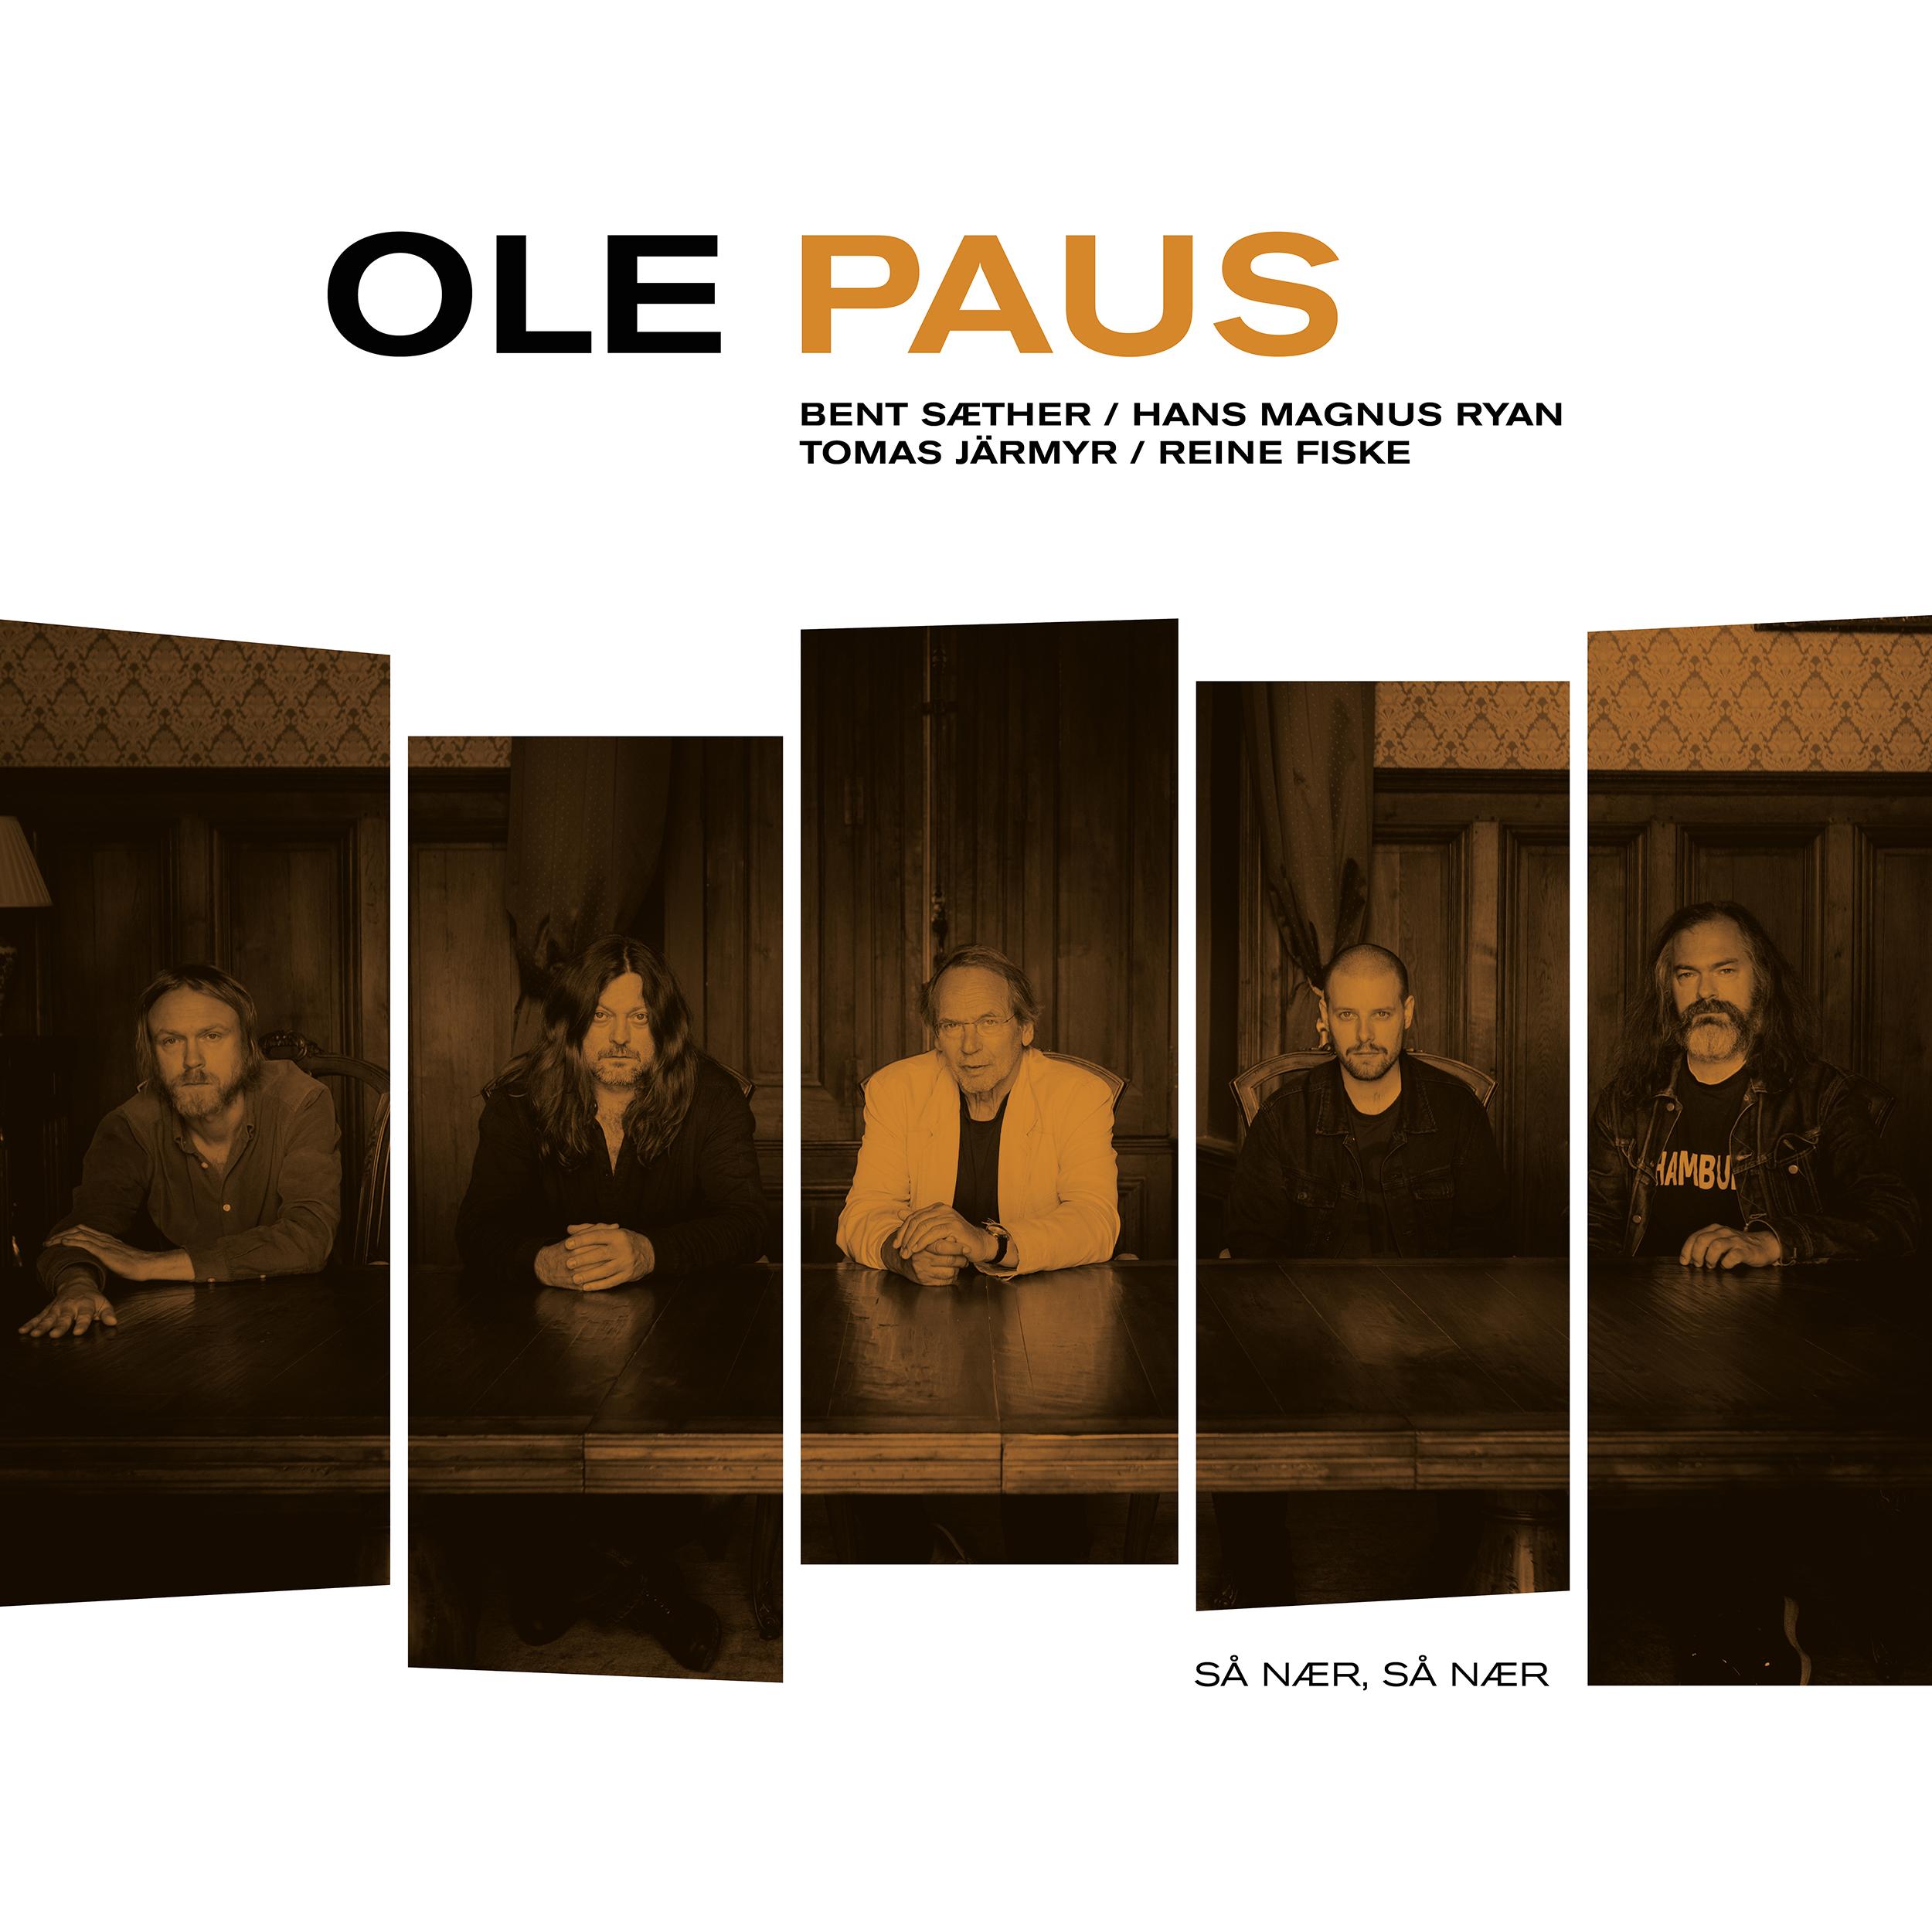 Ole Paus - Så nær, så nær [2xLP]